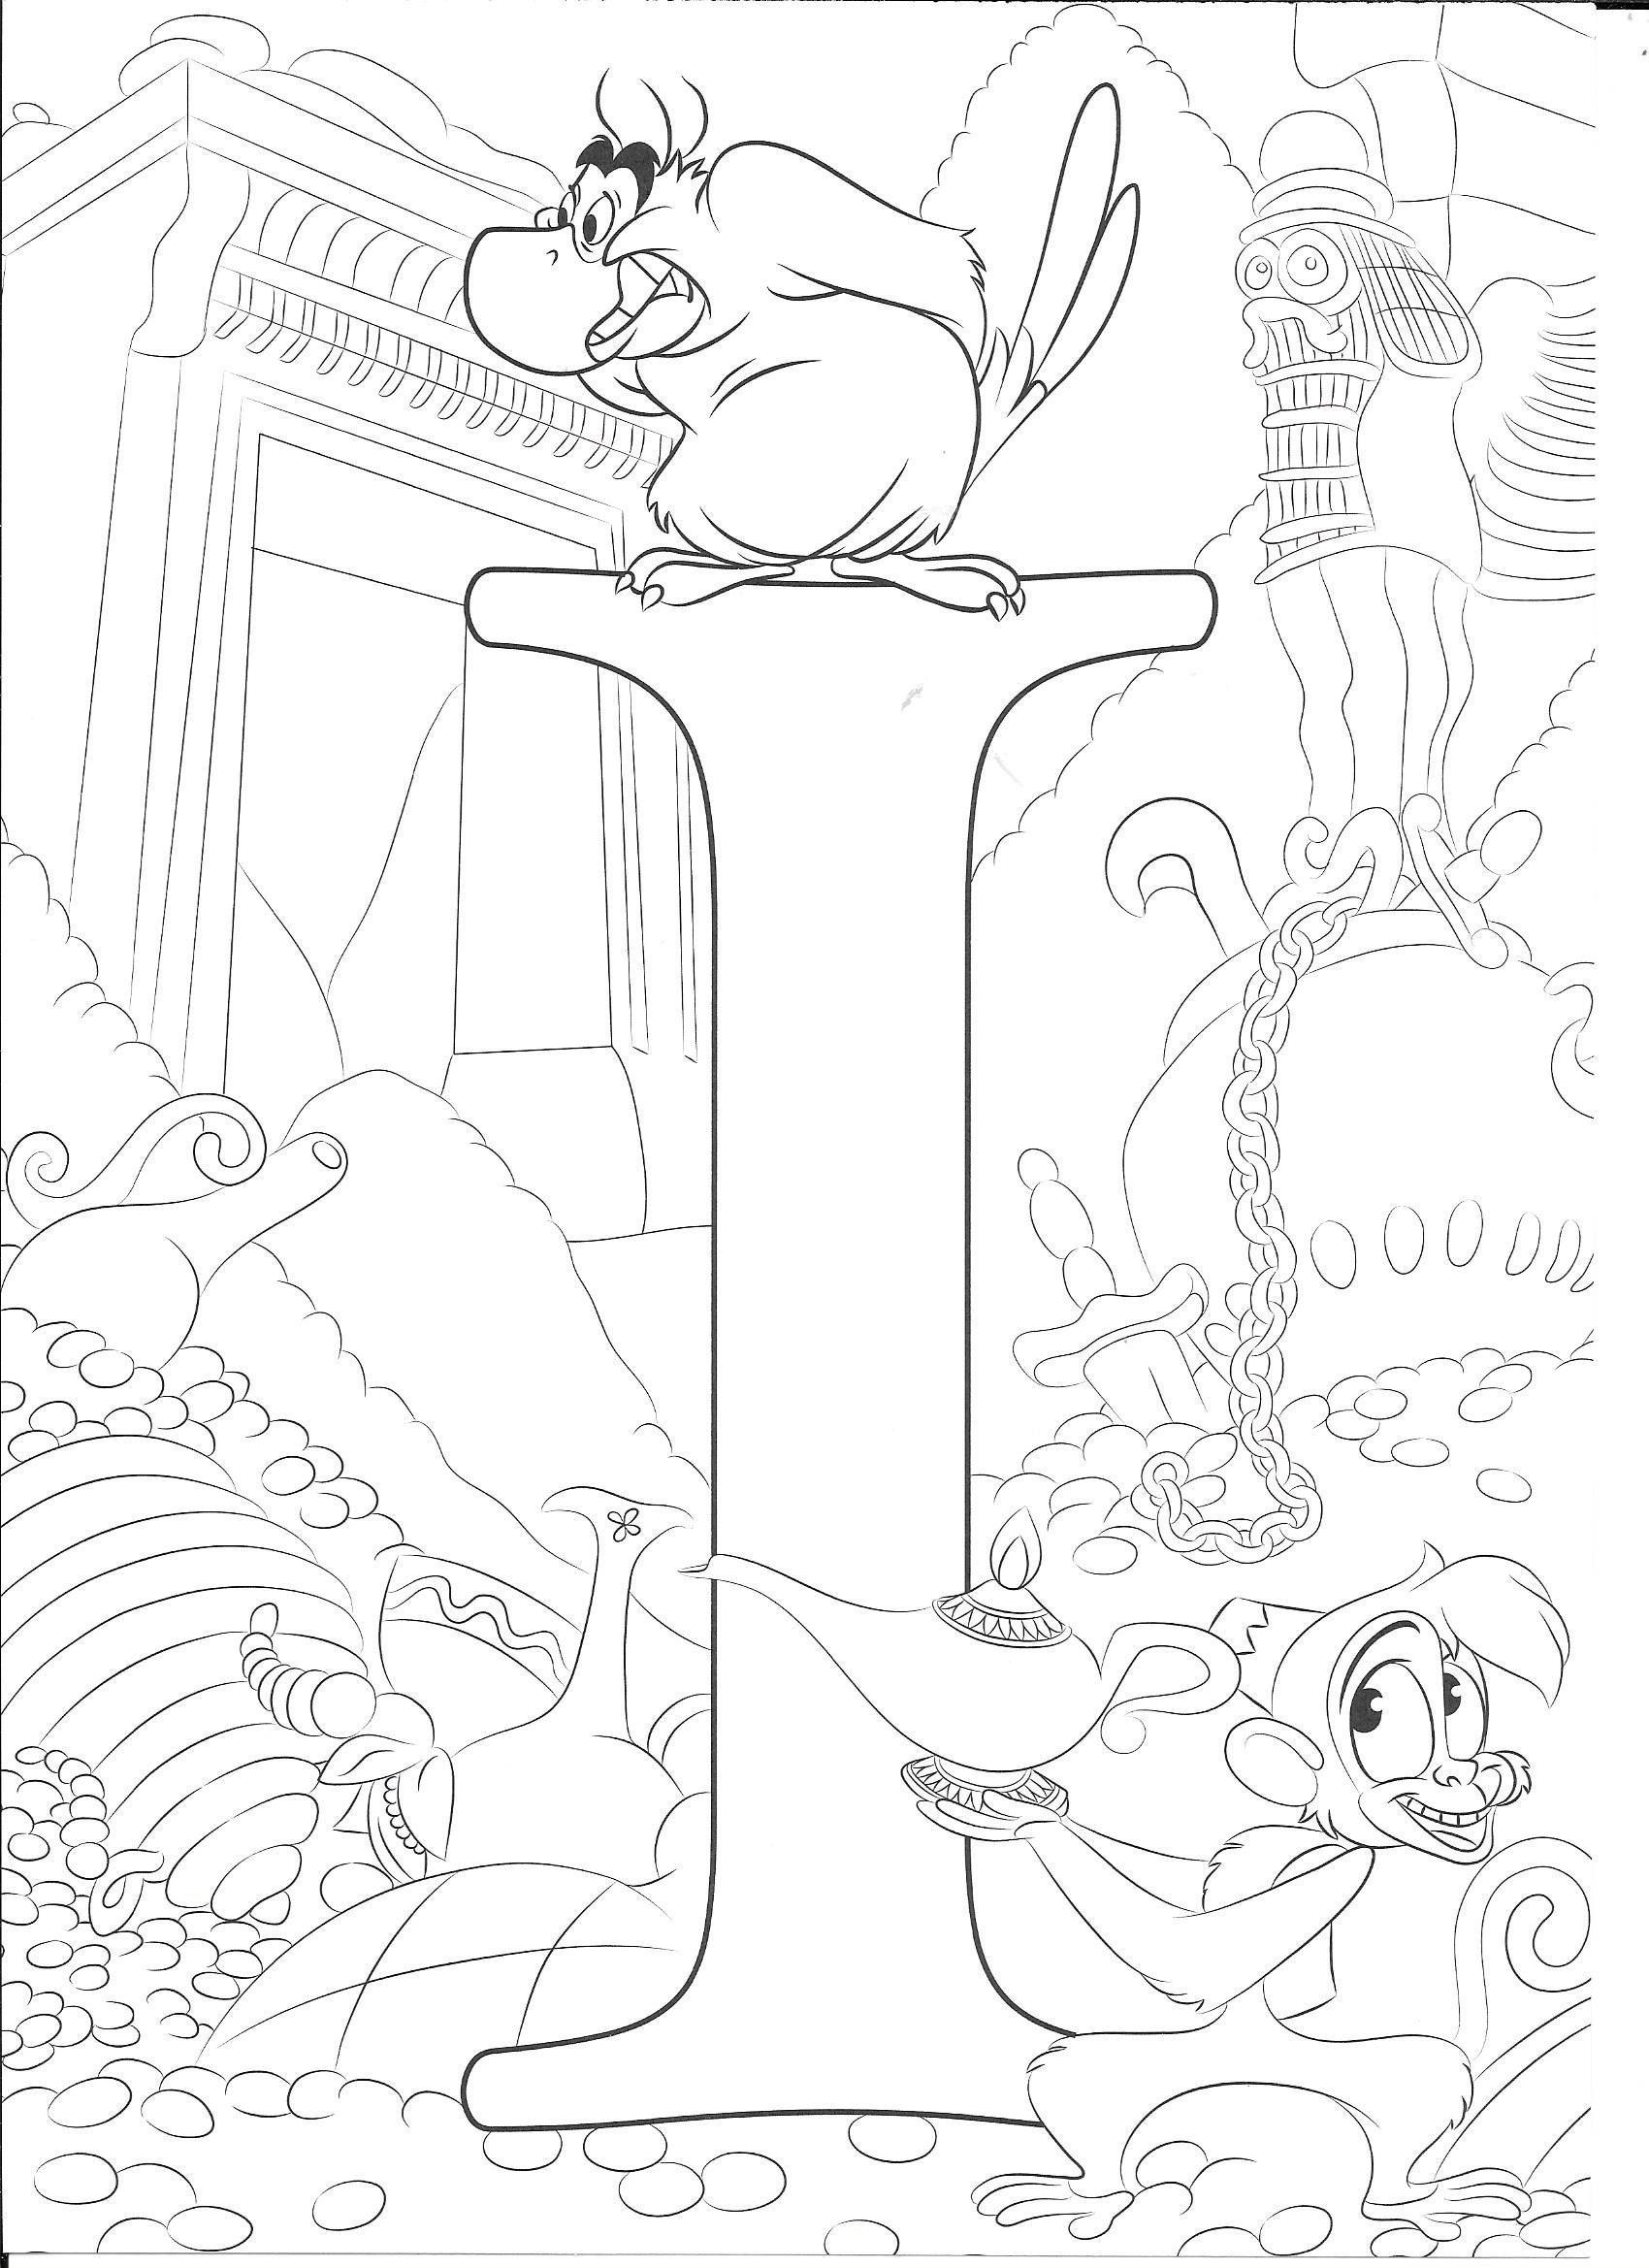 Coloring Page Disney Coloring Sheets Disney Coloring Pages Disney Alphabet In 2021 Abc Coloring Pages Disney Coloring Sheets Disney Coloring Pages